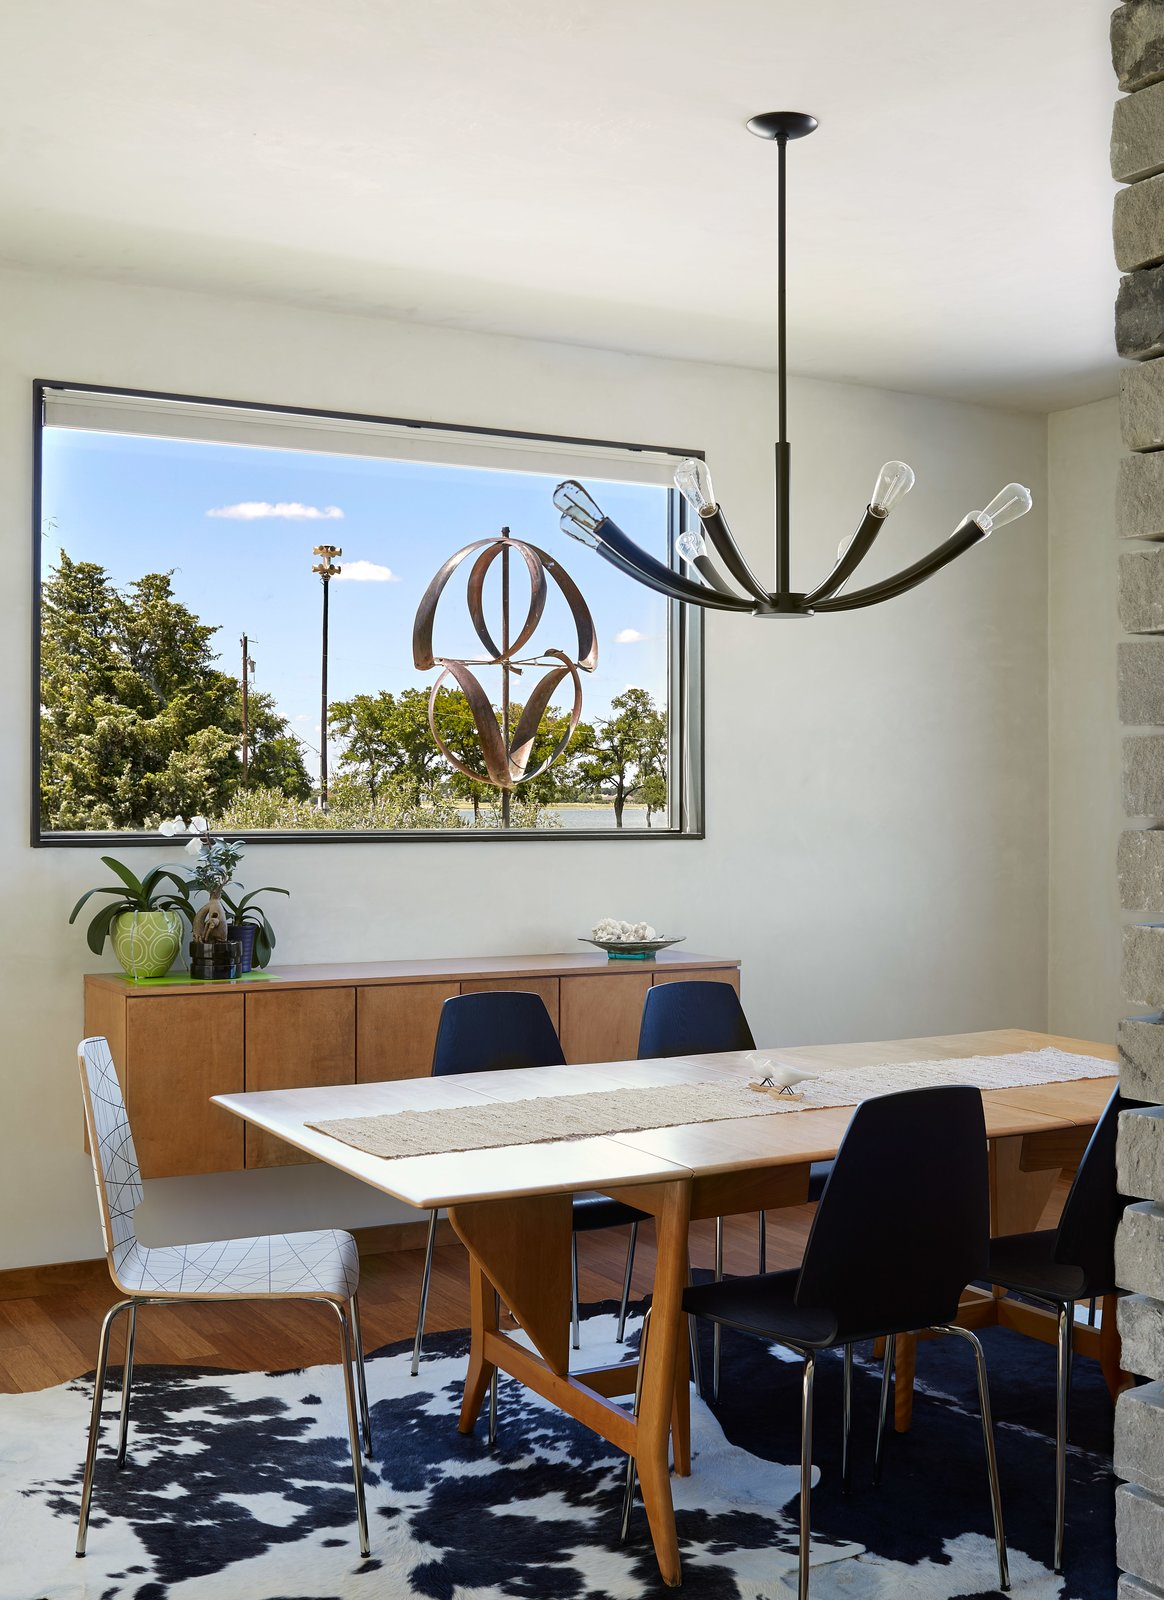 Dining Room, Medium Hardwood Floor, Ceiling Lighting, Table, Chair, and Storage  Lake Waxahachie Home by Mark Odom Studio